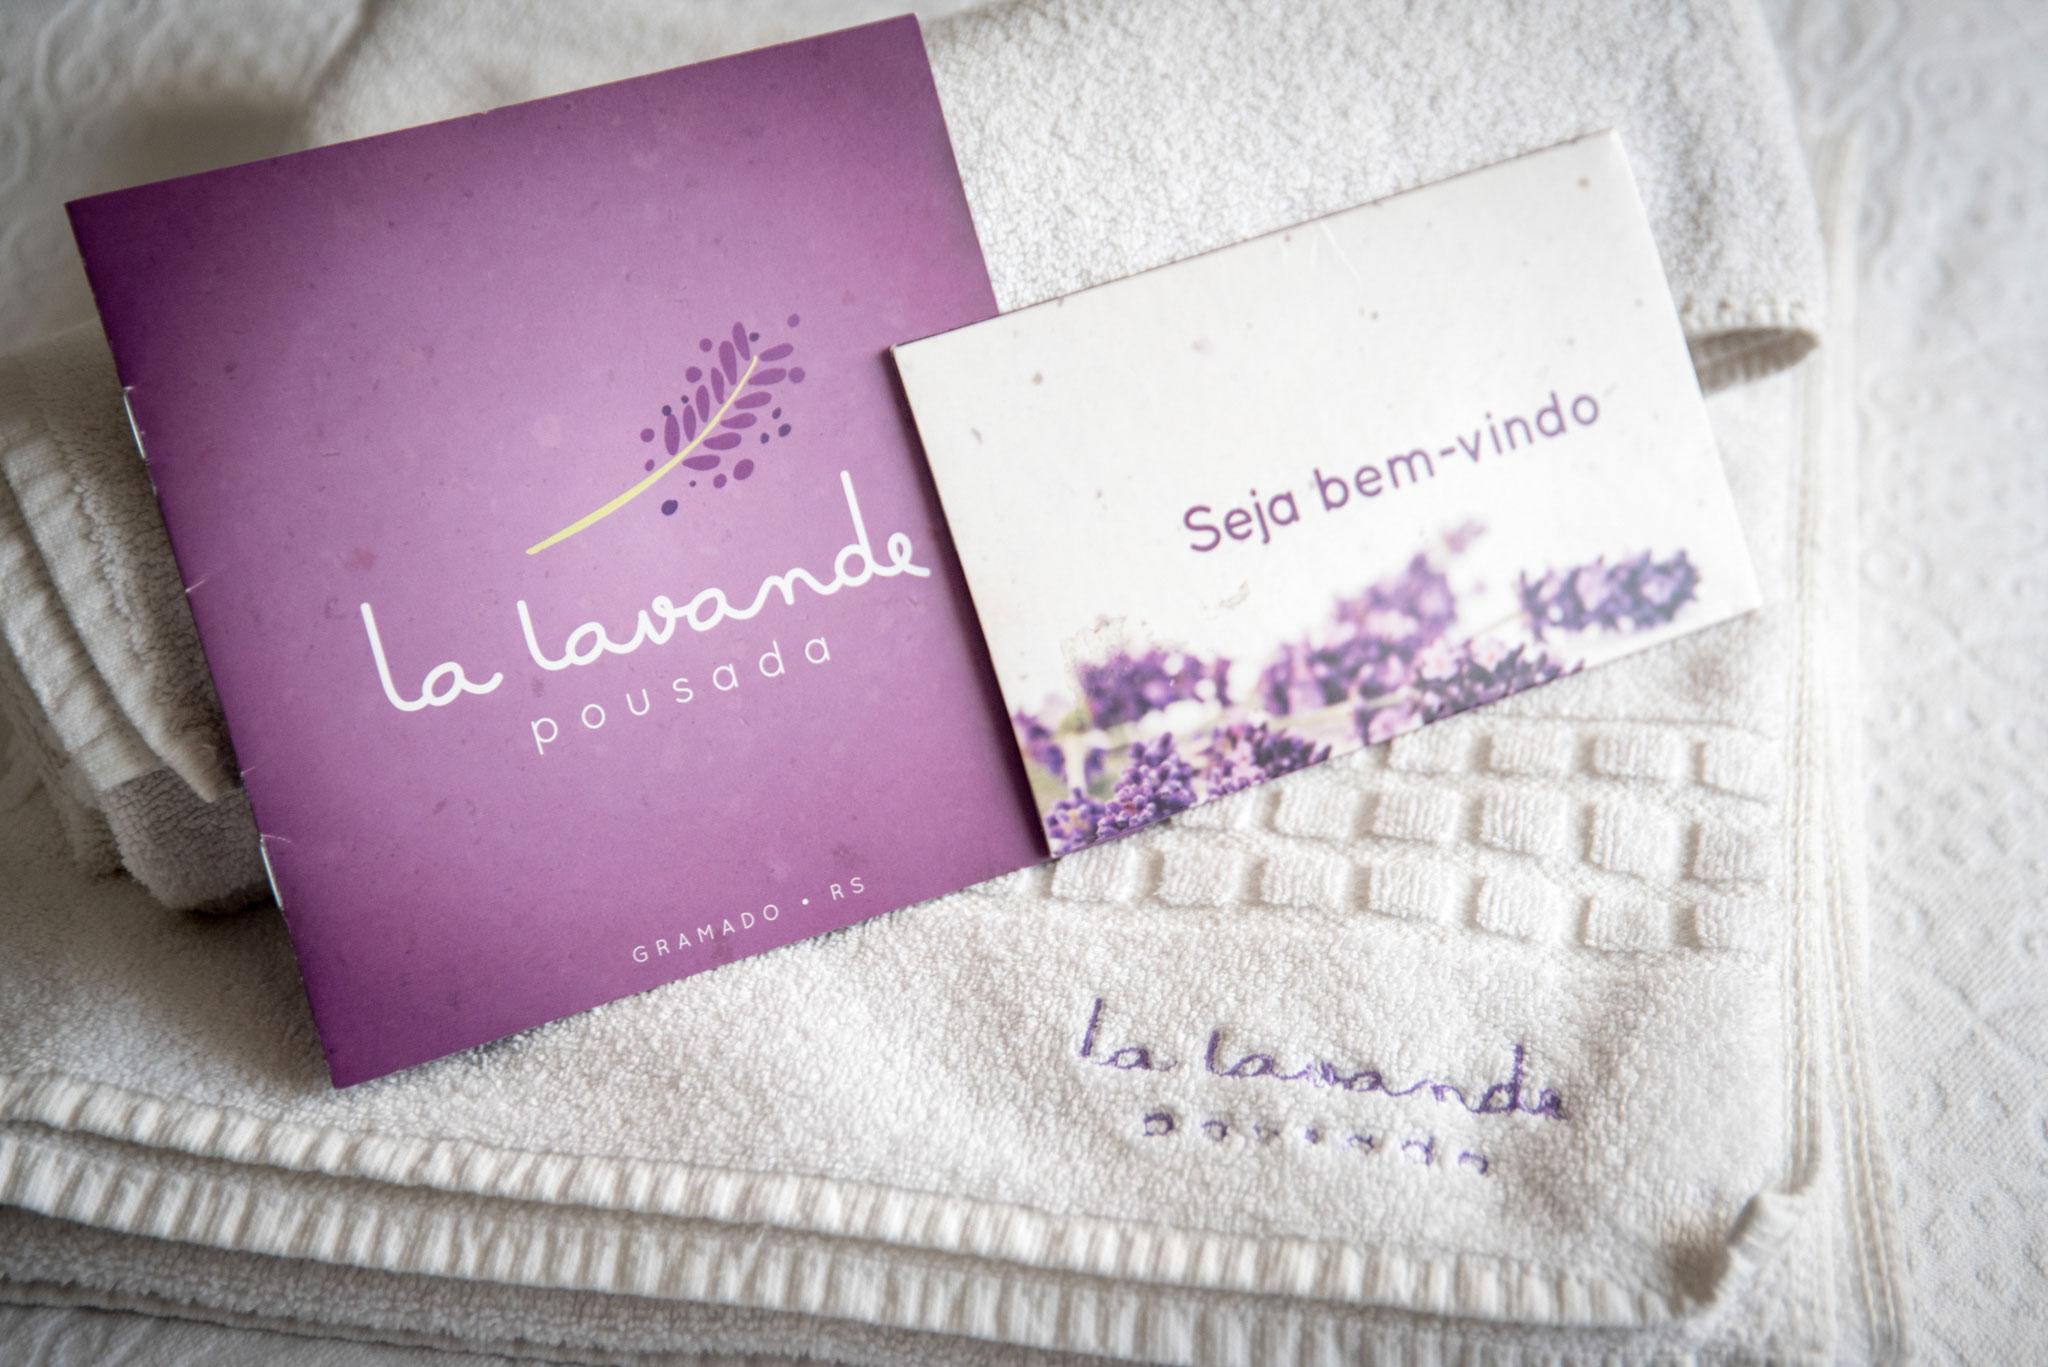 Pousada em Gramado - La Lavande